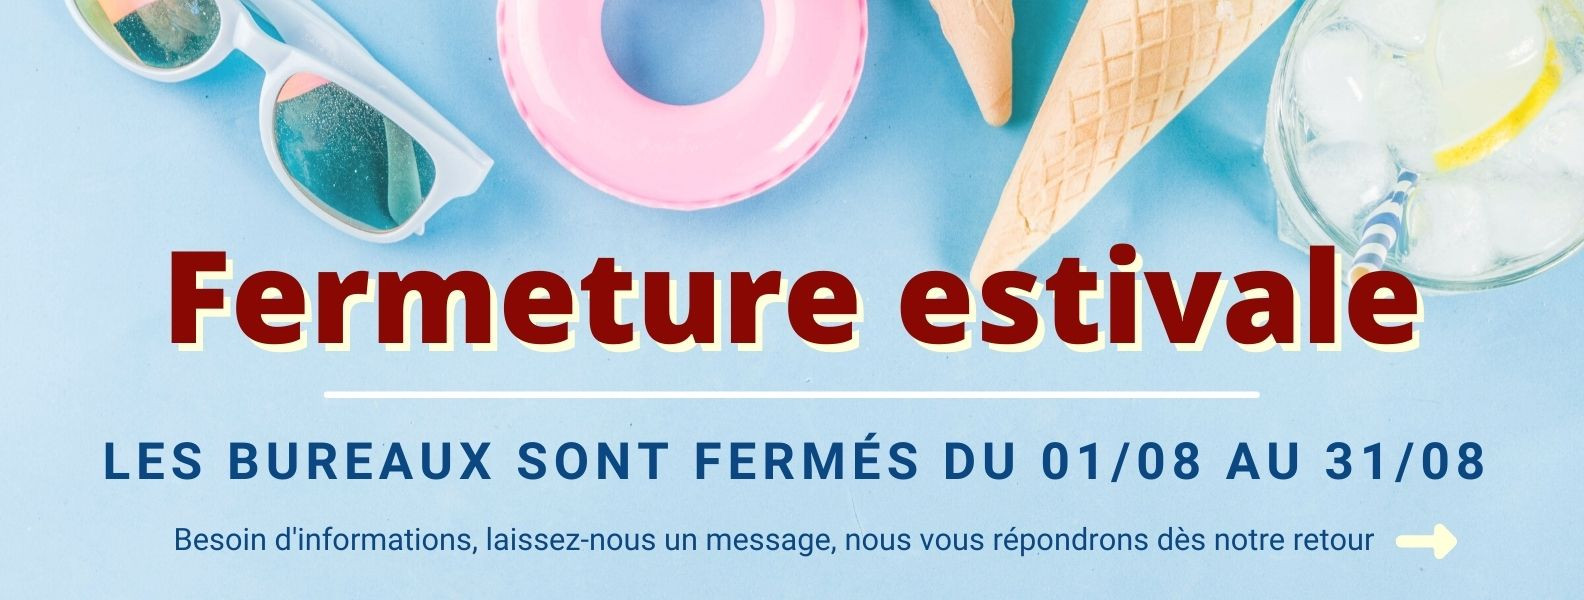 Fermeture estivale AMTb - Essonne 91